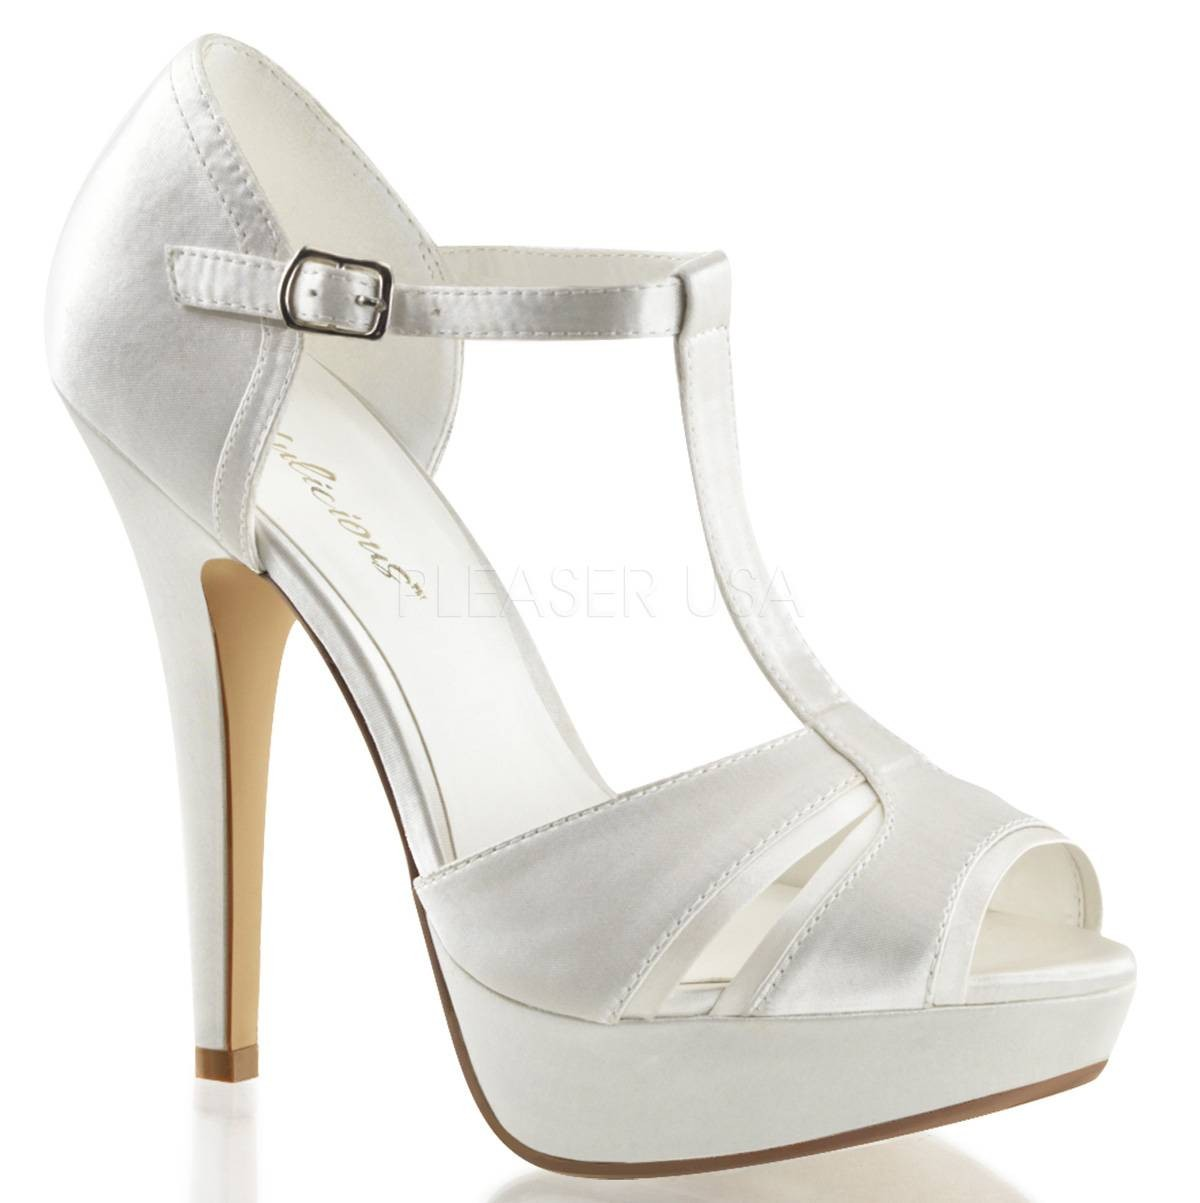 Highheels - LOLITA 20 ° Damen Peep Toe Sandalette ° Weiß Satin ° Fabulicious  - Onlineshop RedSixty